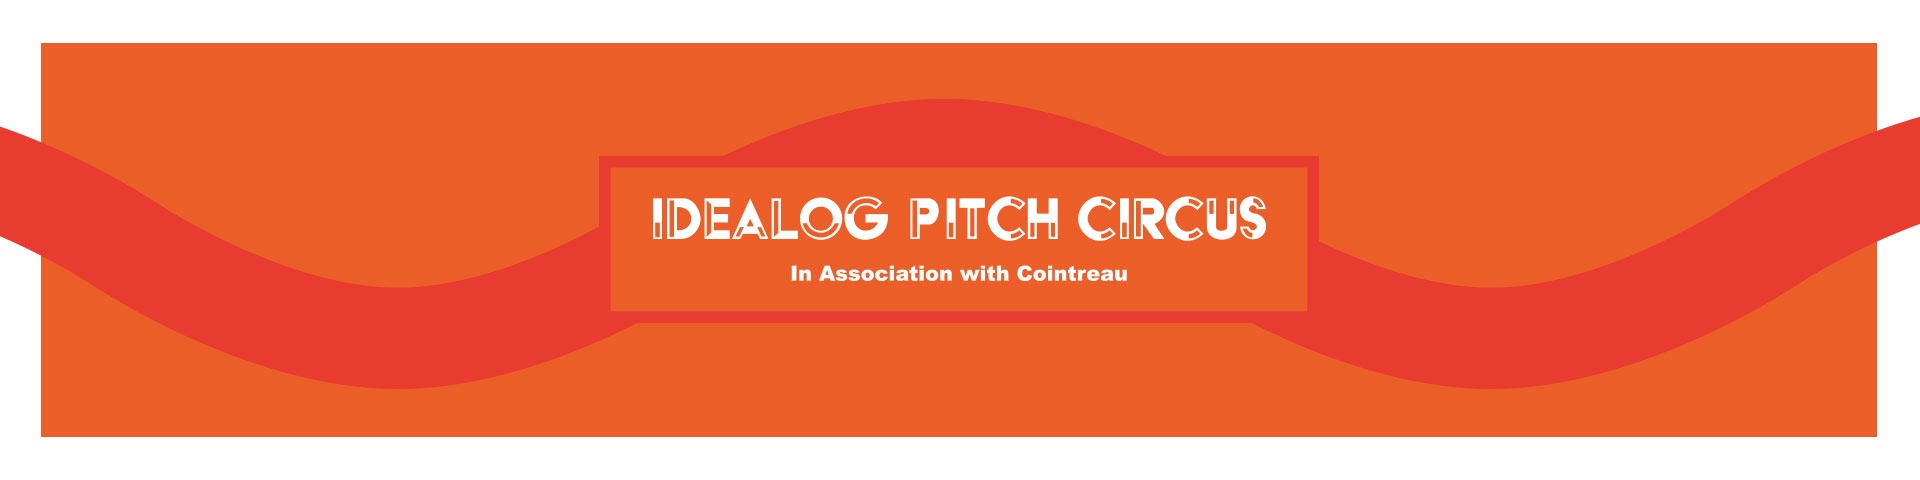 Pitch Circus